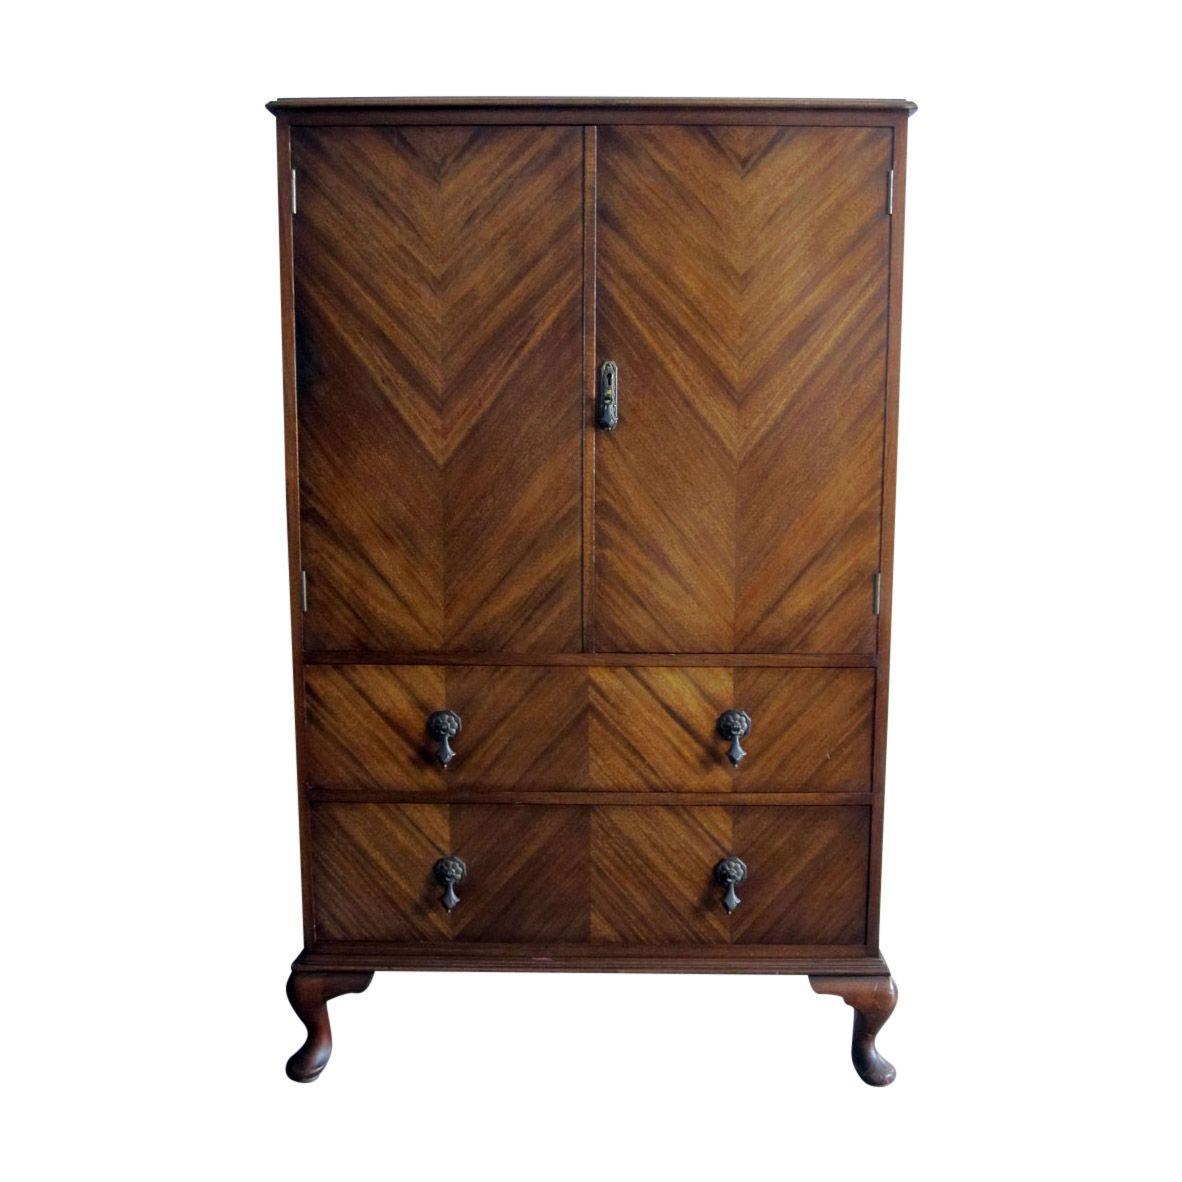 Waring & Gillow Veneered Millinery Cabinet